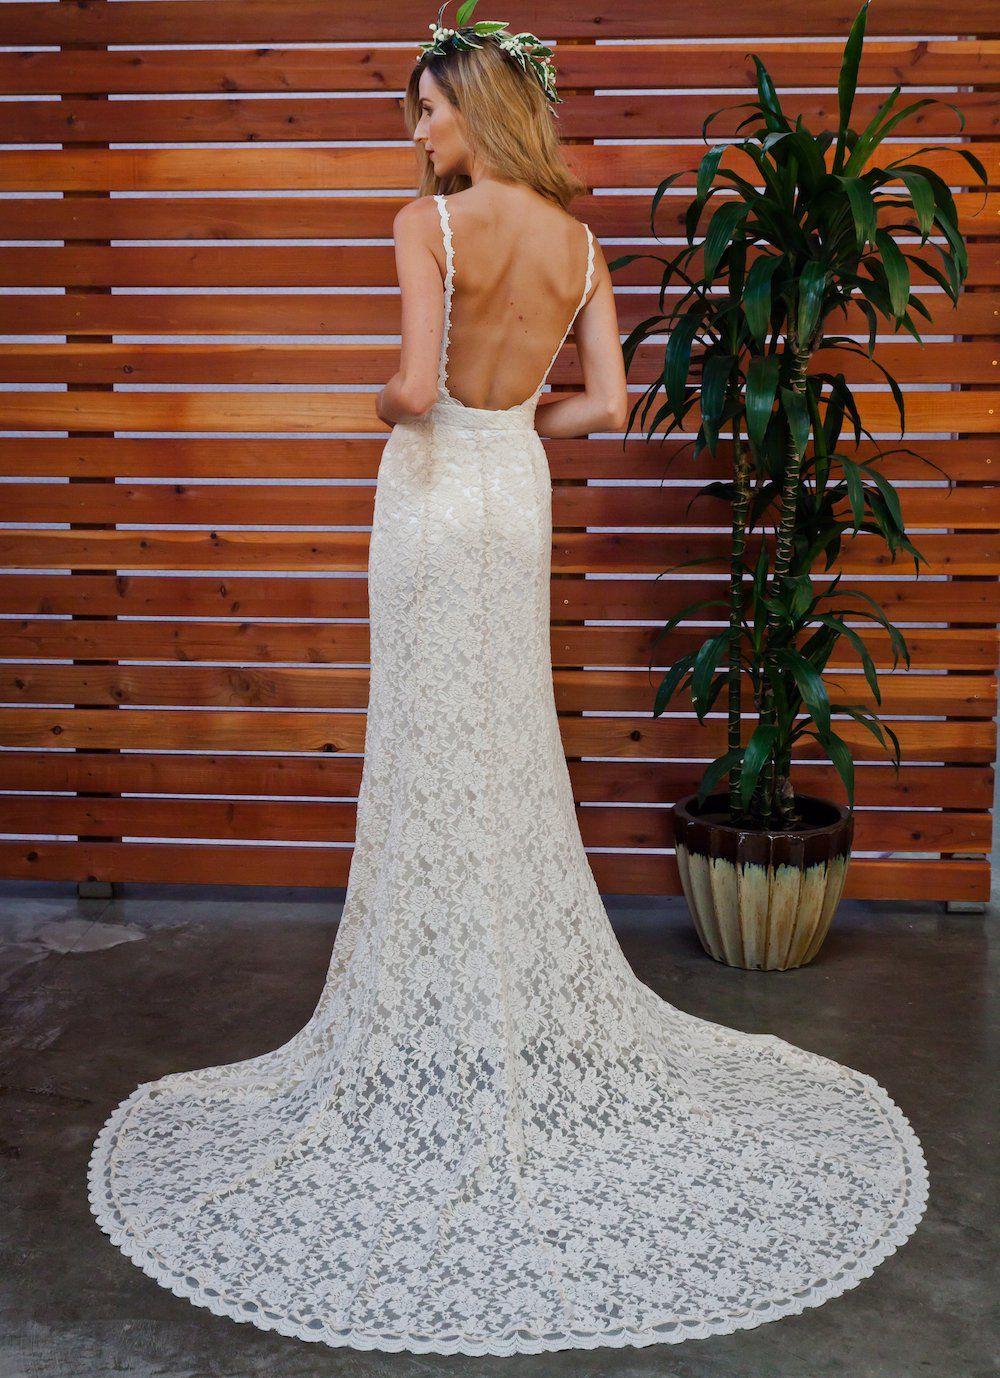 Wedding dress bodysuit  Bianca  Carla   Wedding dresses  Pinterest  Wedding dress